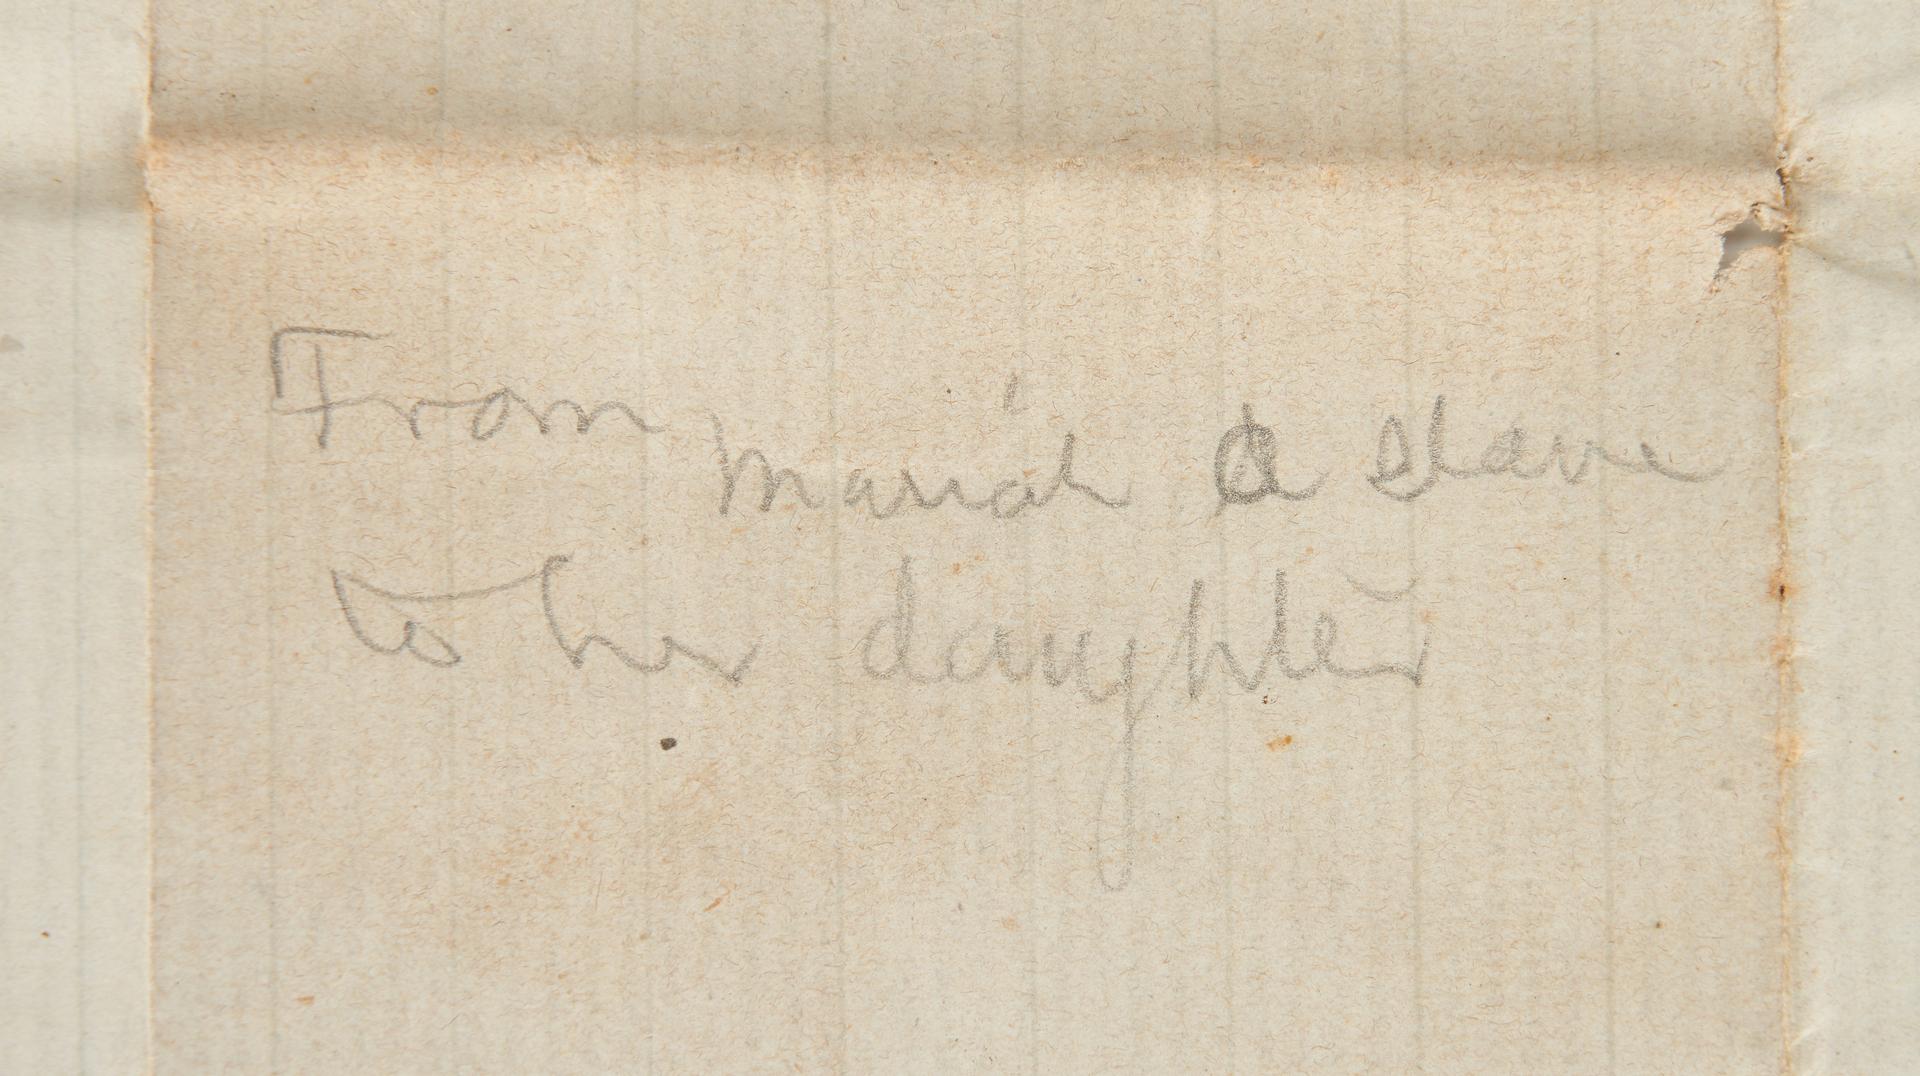 Lot 639: 1859 VA Letter Written by Slave named Mariah (2 items)